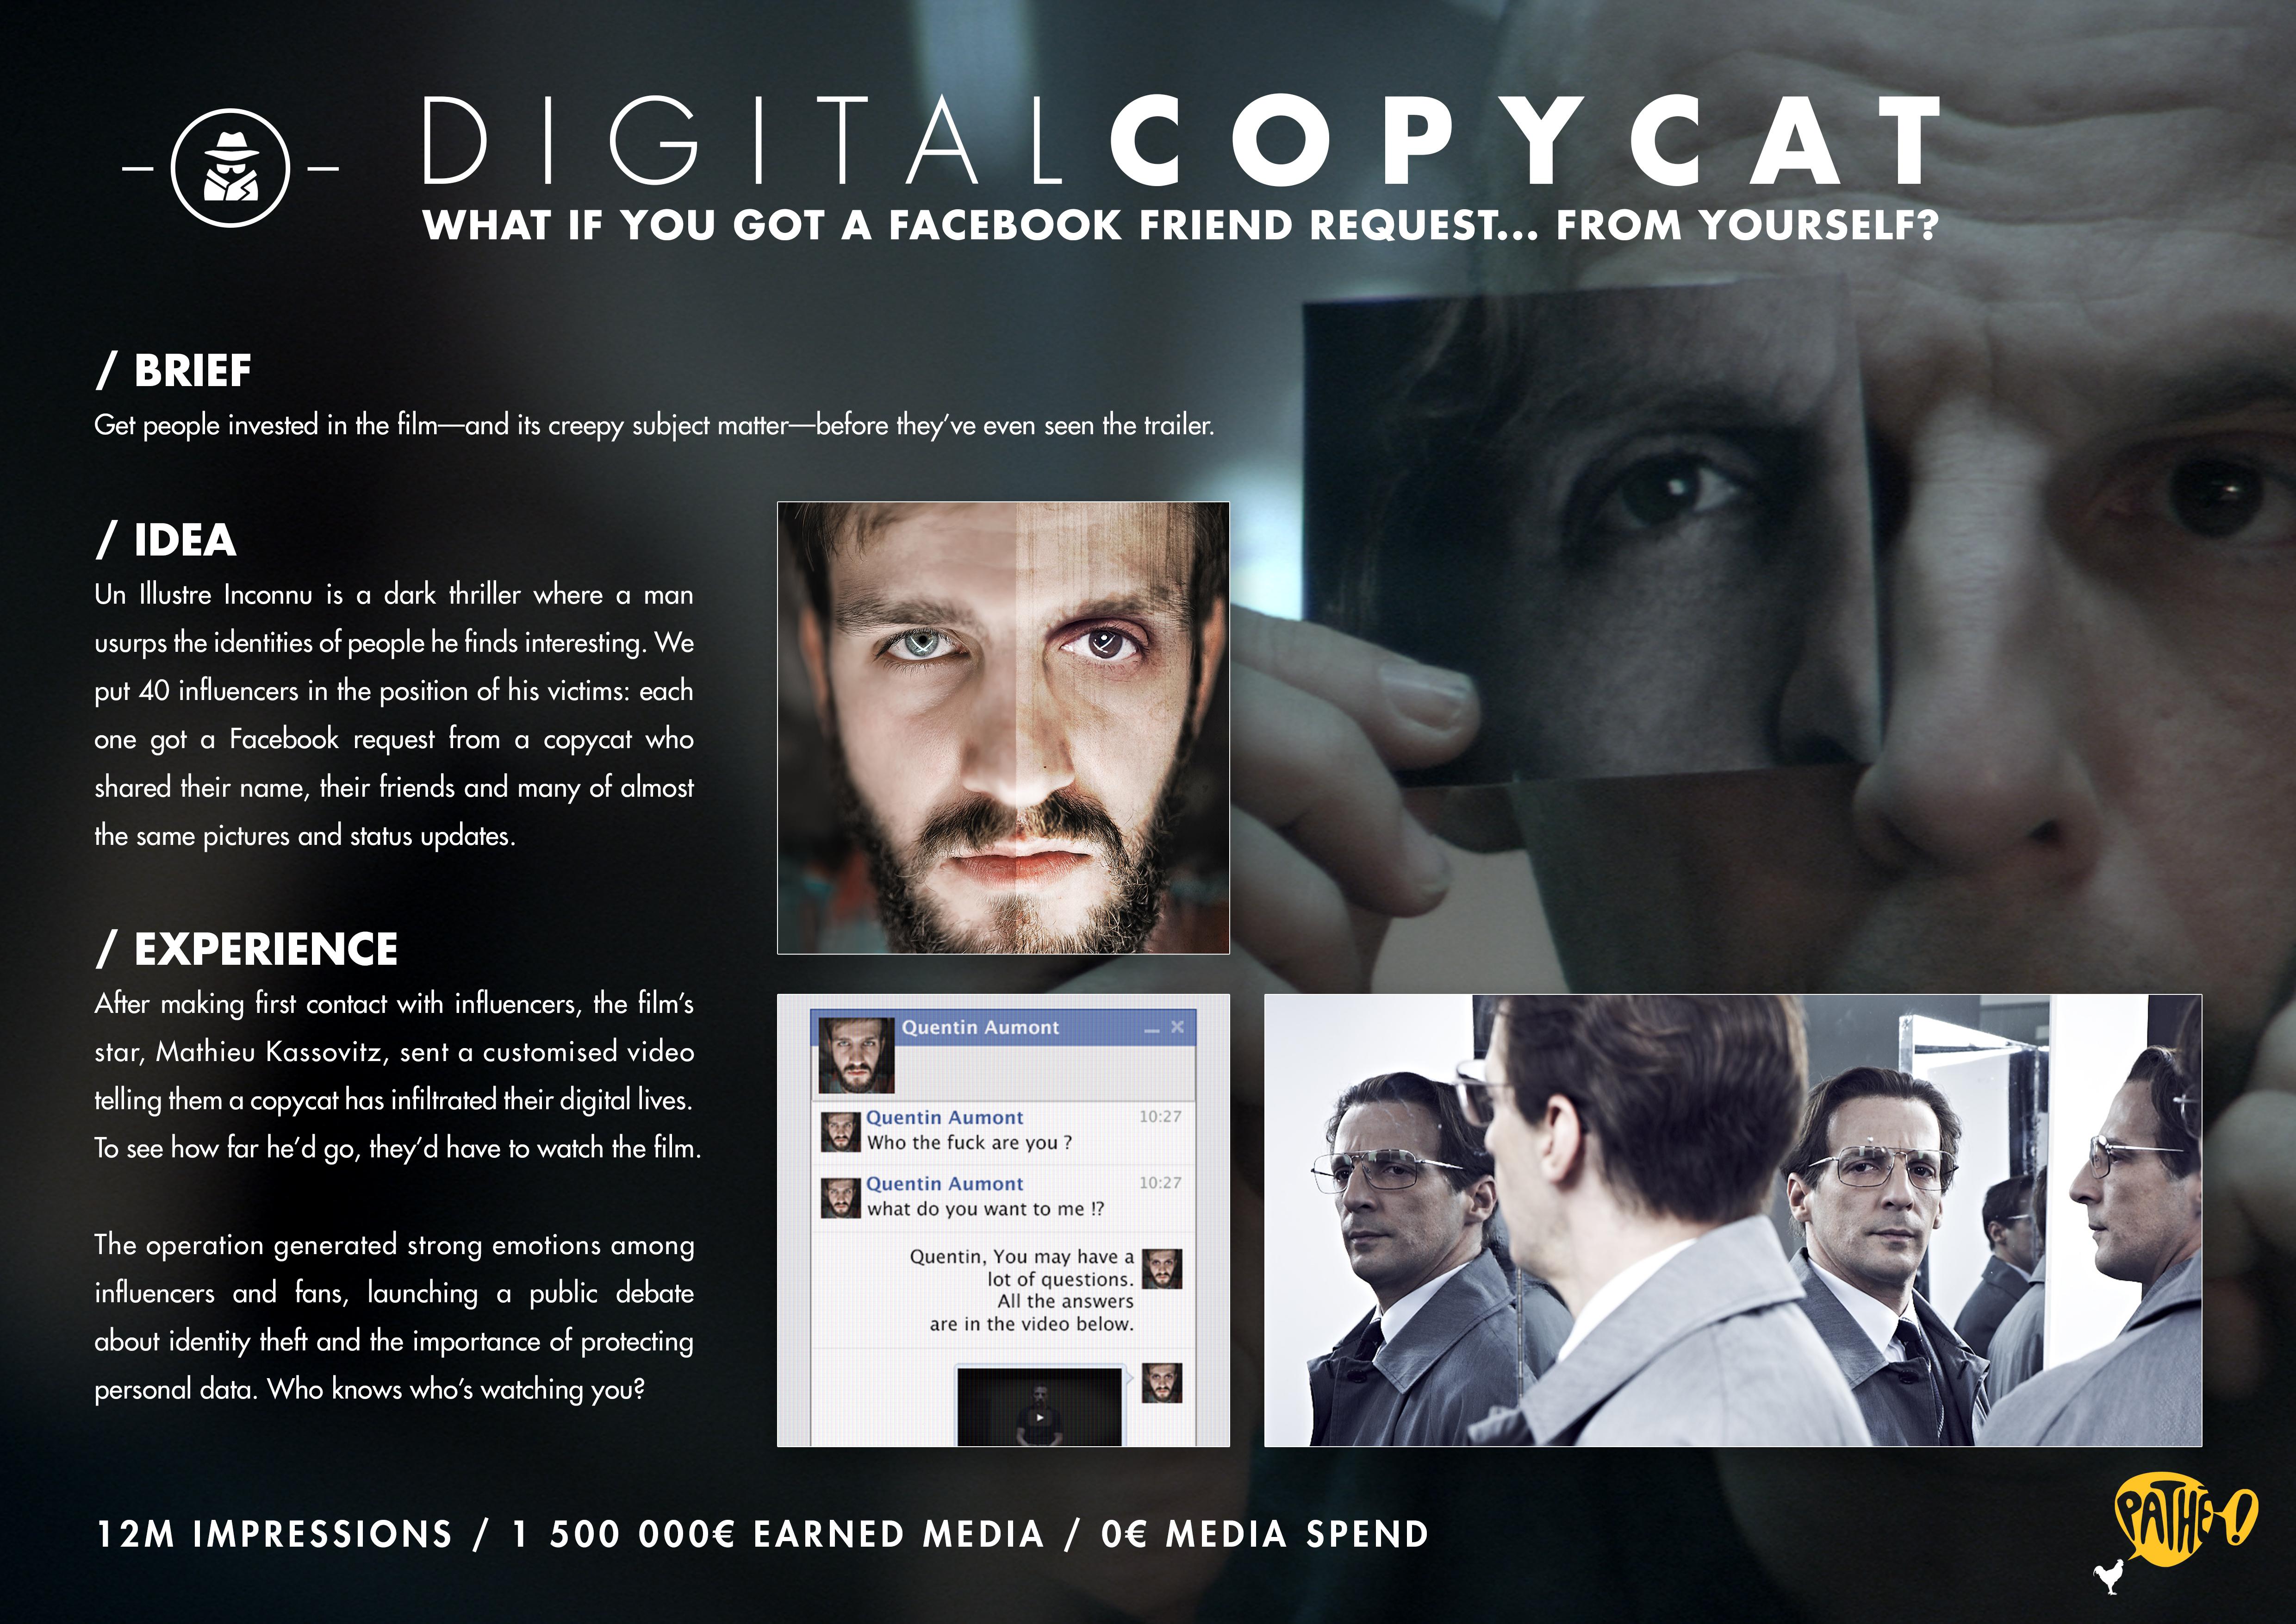 Un Illustre Inconnu steals the Facebook identities of 40